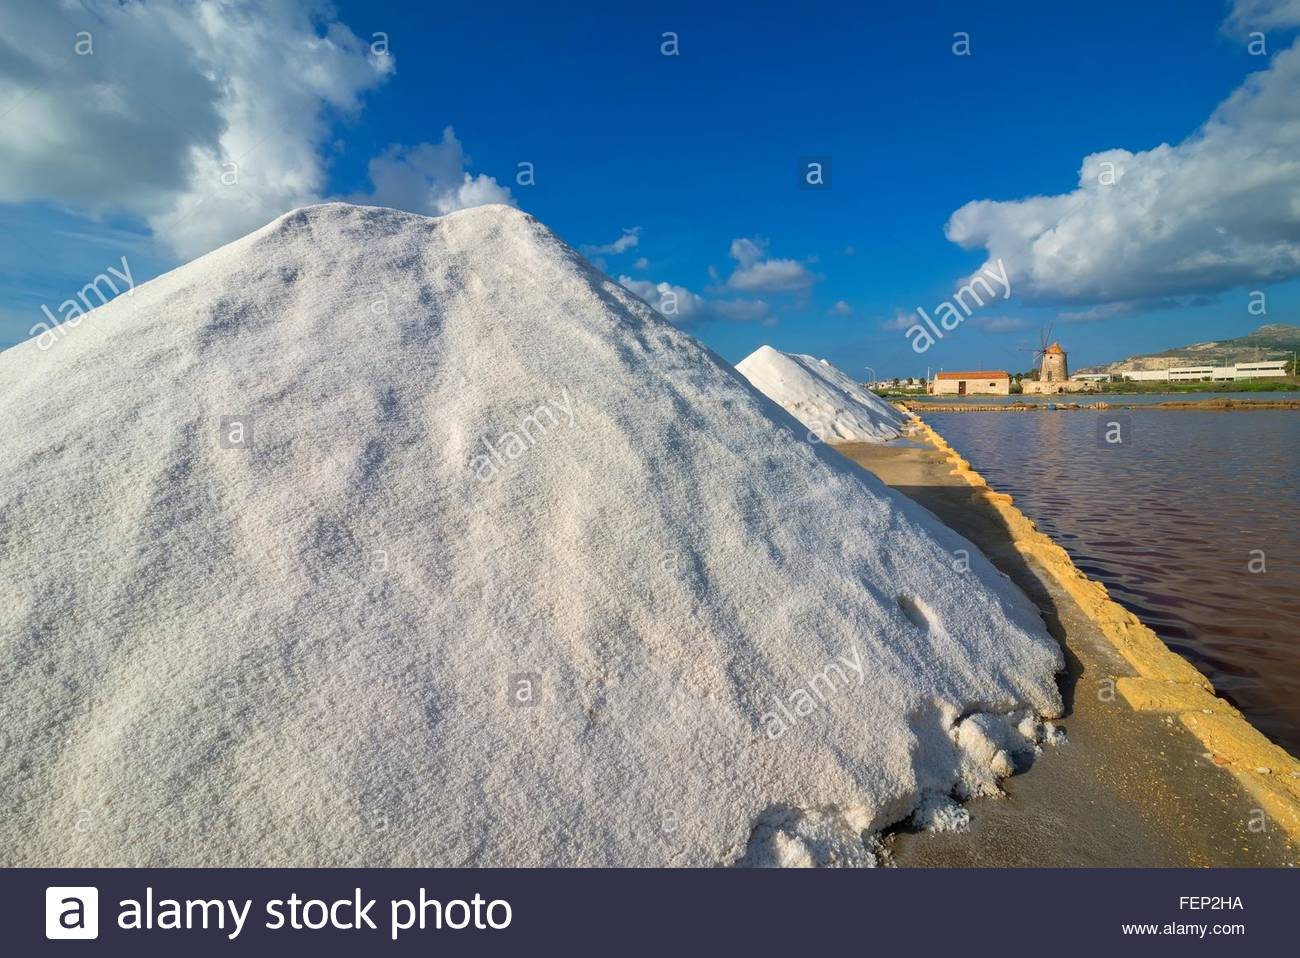 Salz-Stacks auf Salzpfanne Uferpromenade, Trapani, Sizilien, Italien Stockbild